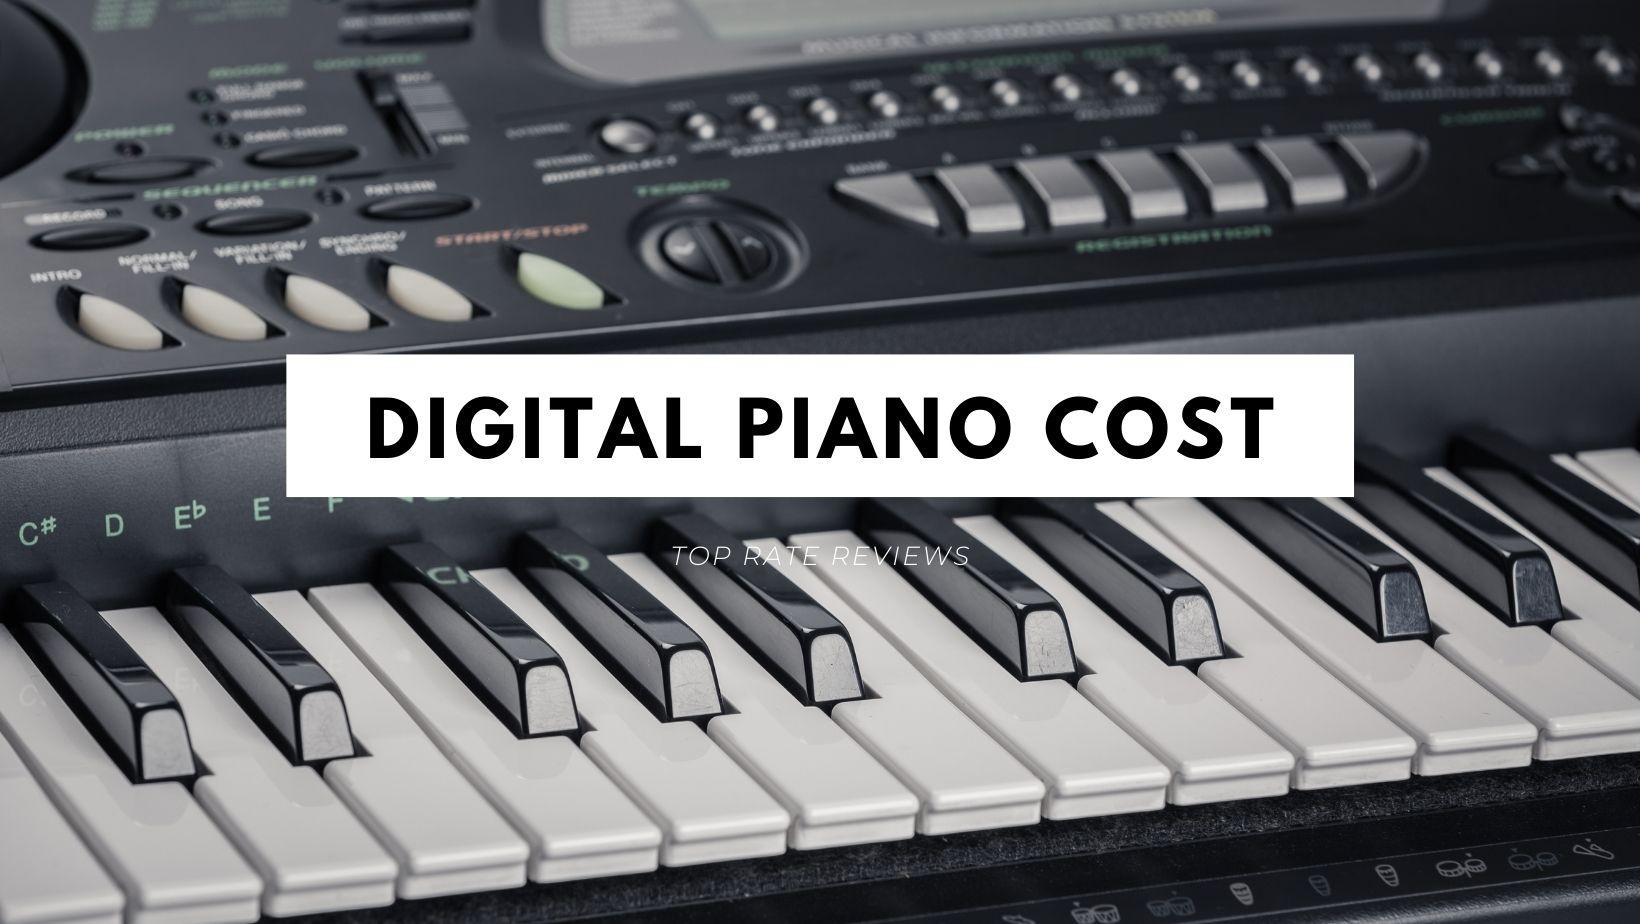 Digital Piano Cost